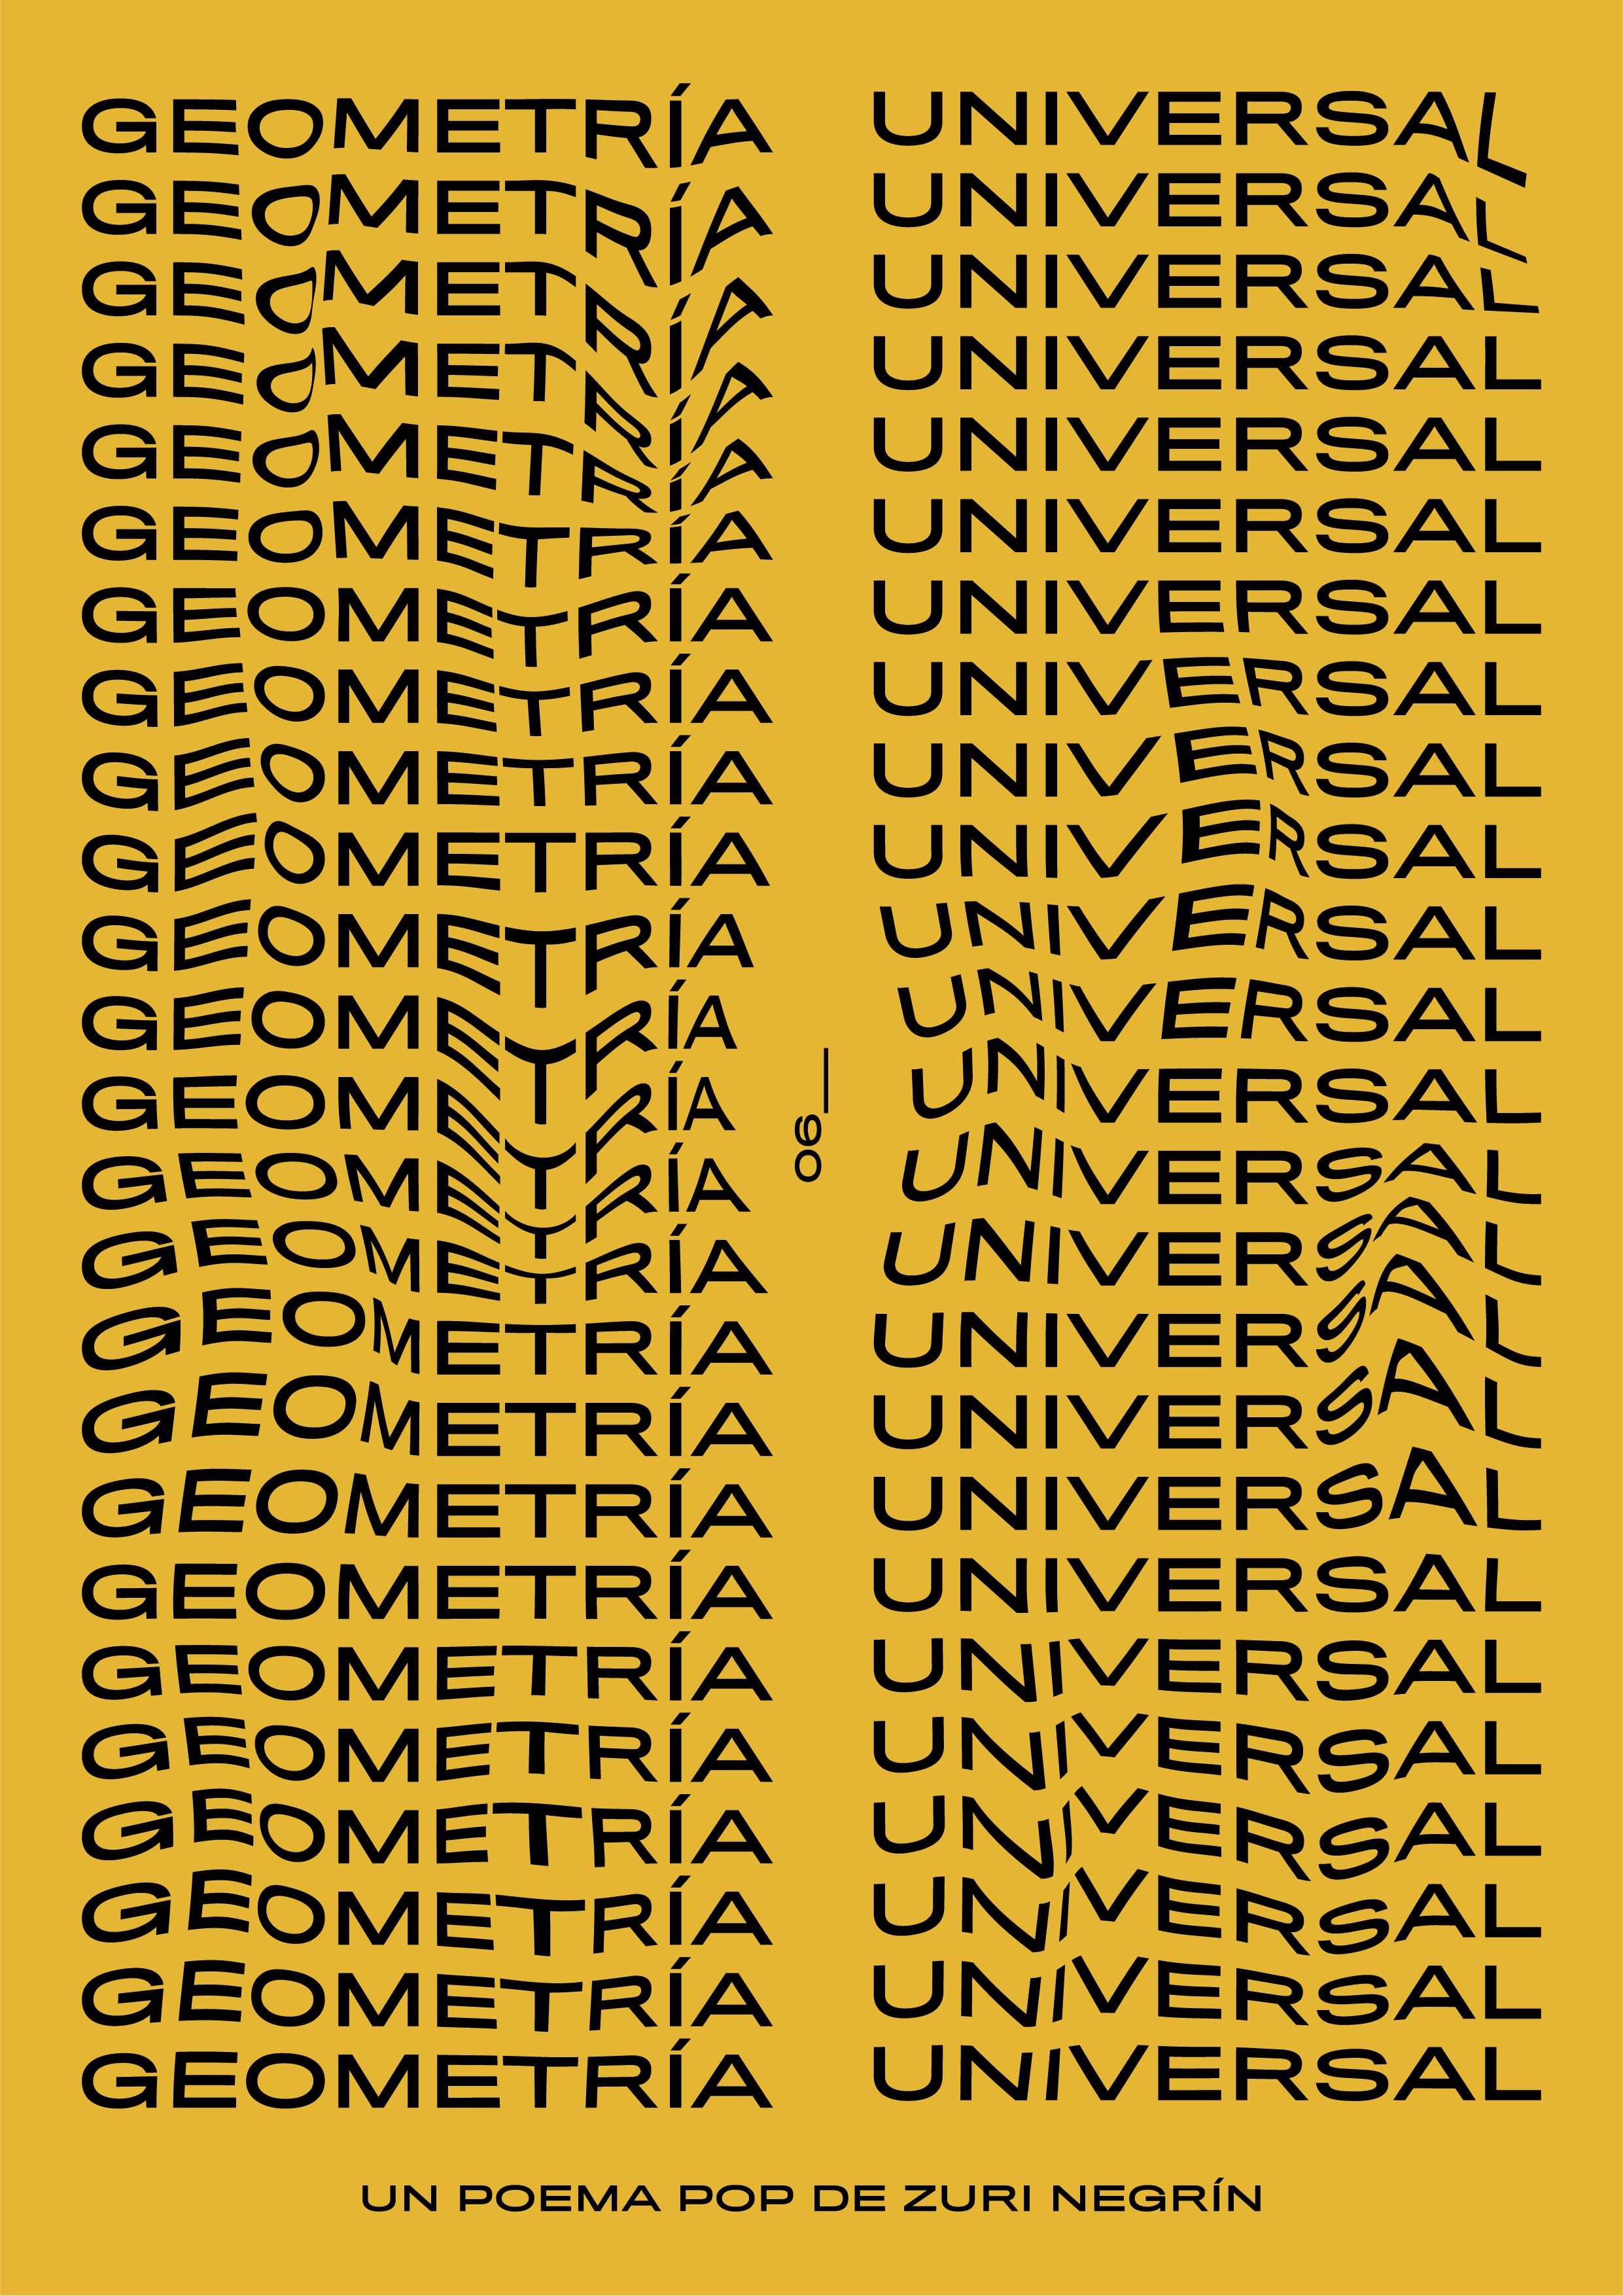 POP_06 Geometría universal